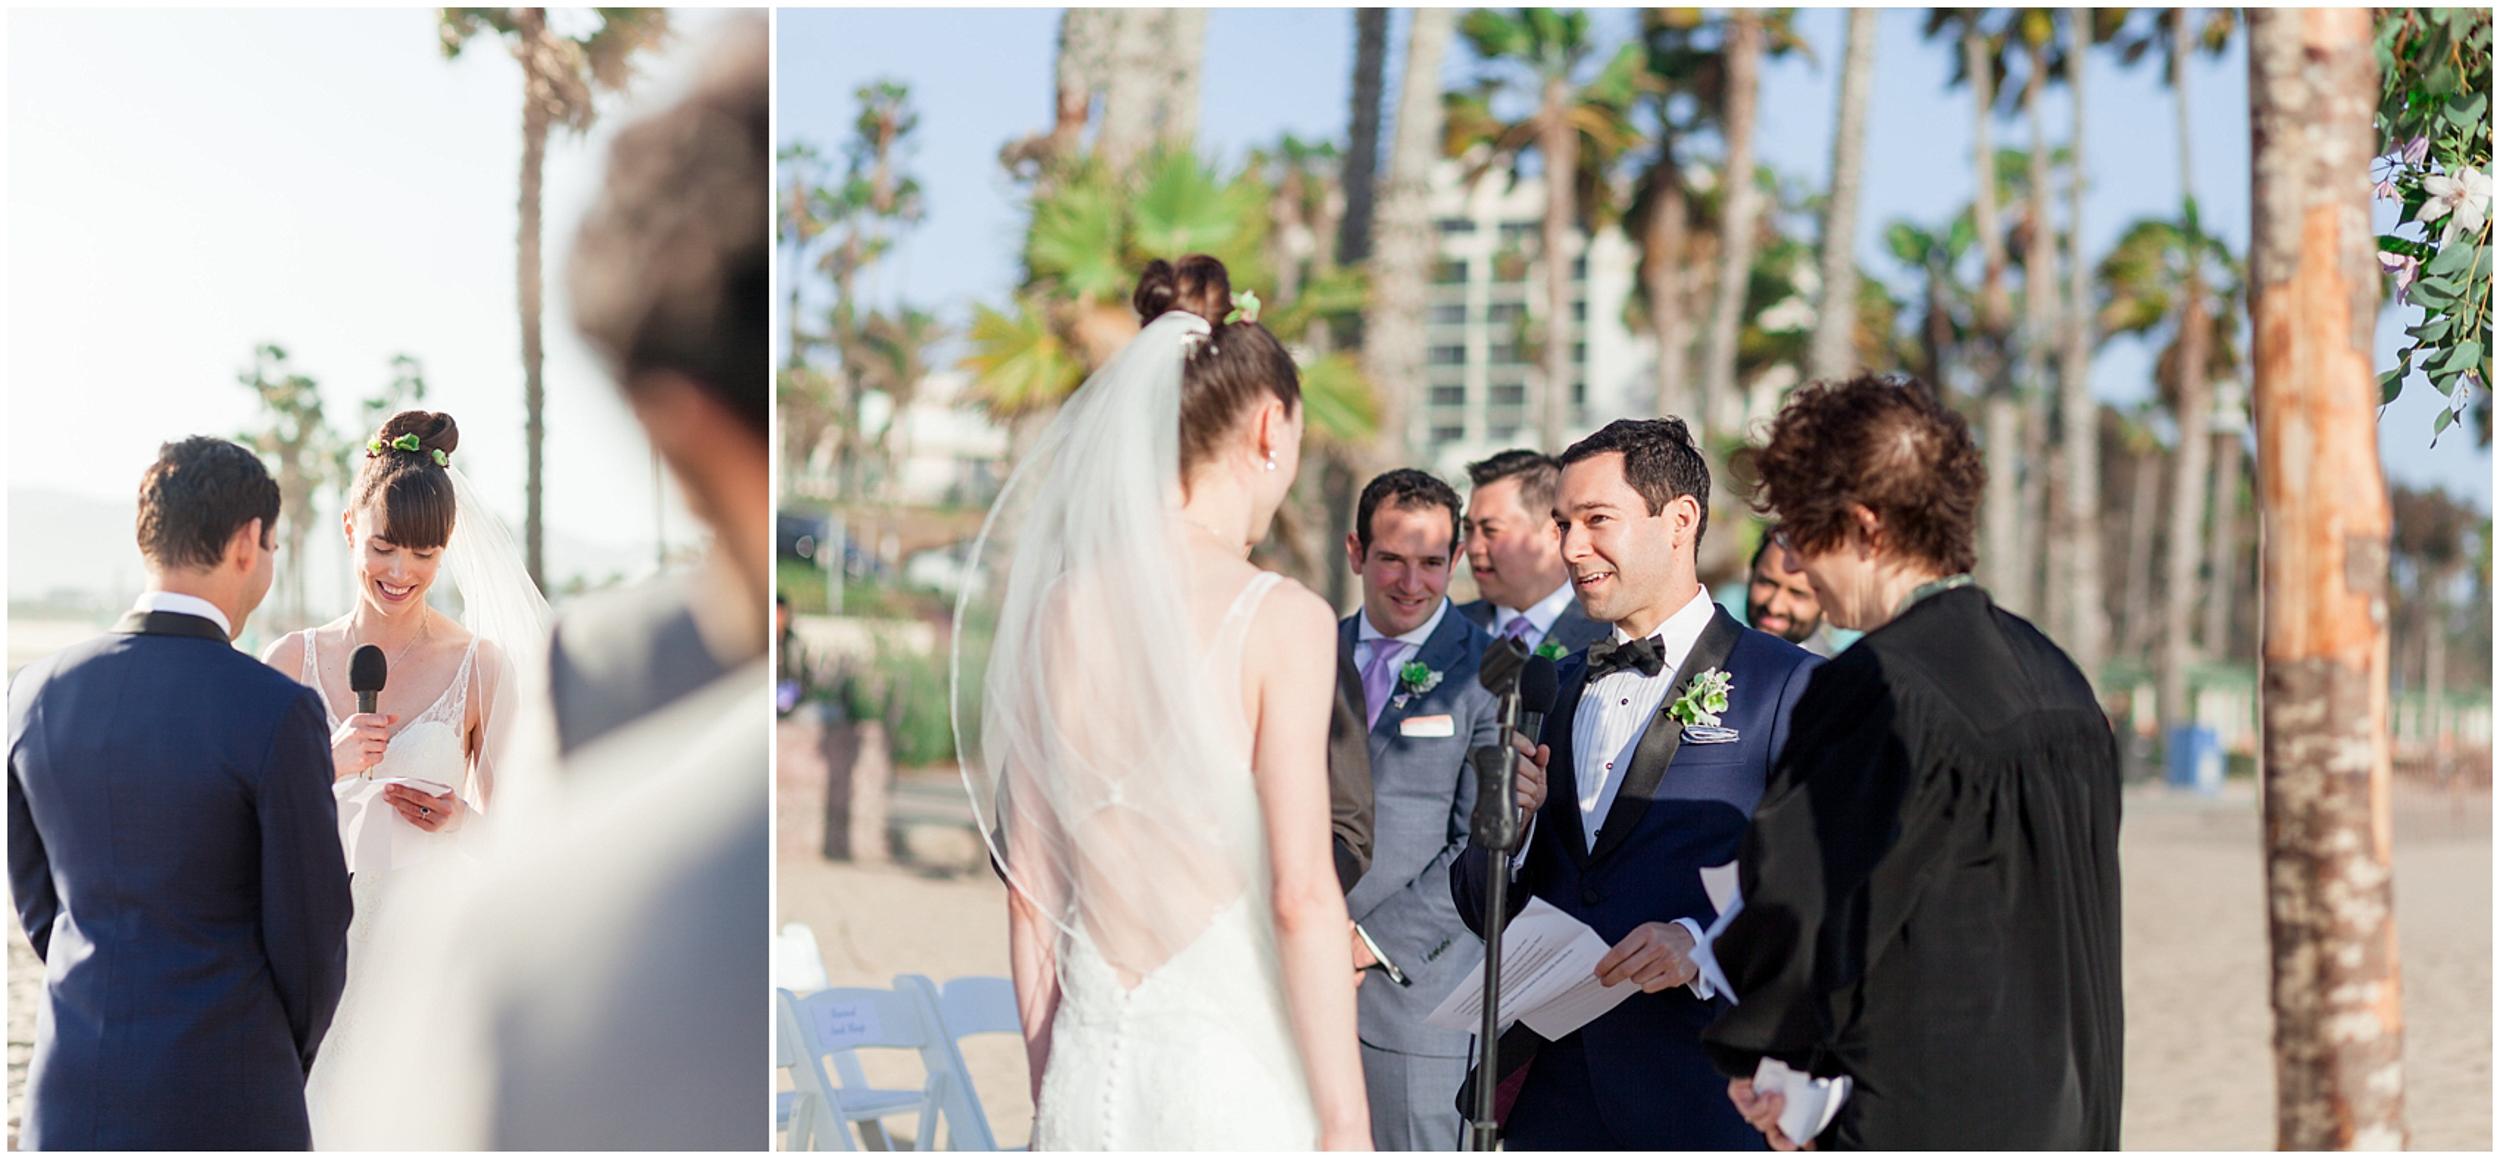 Casa Del Mar Wedding Photography Smetona Photo-0043.jpg